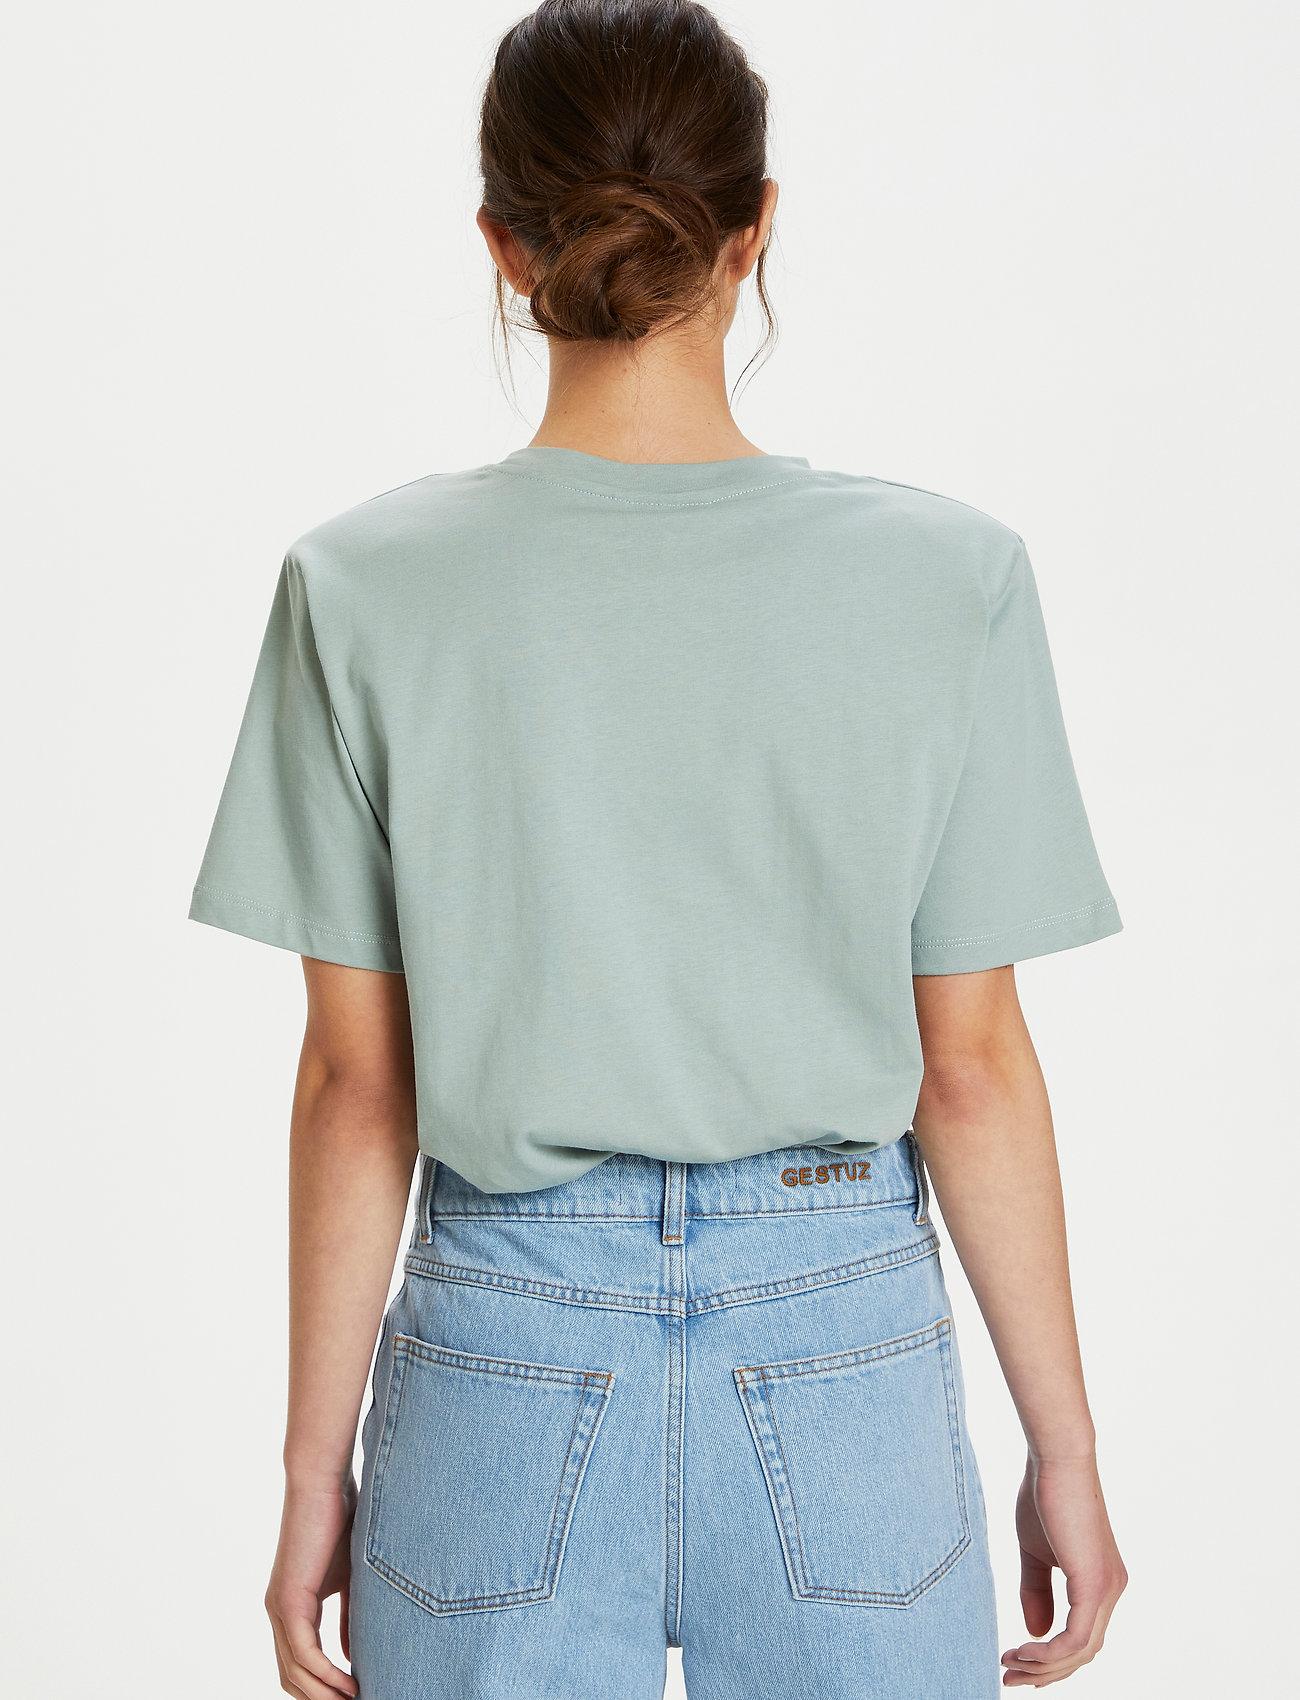 Gestuz - JoryGZ tee - t-shirts - slate gray - 3